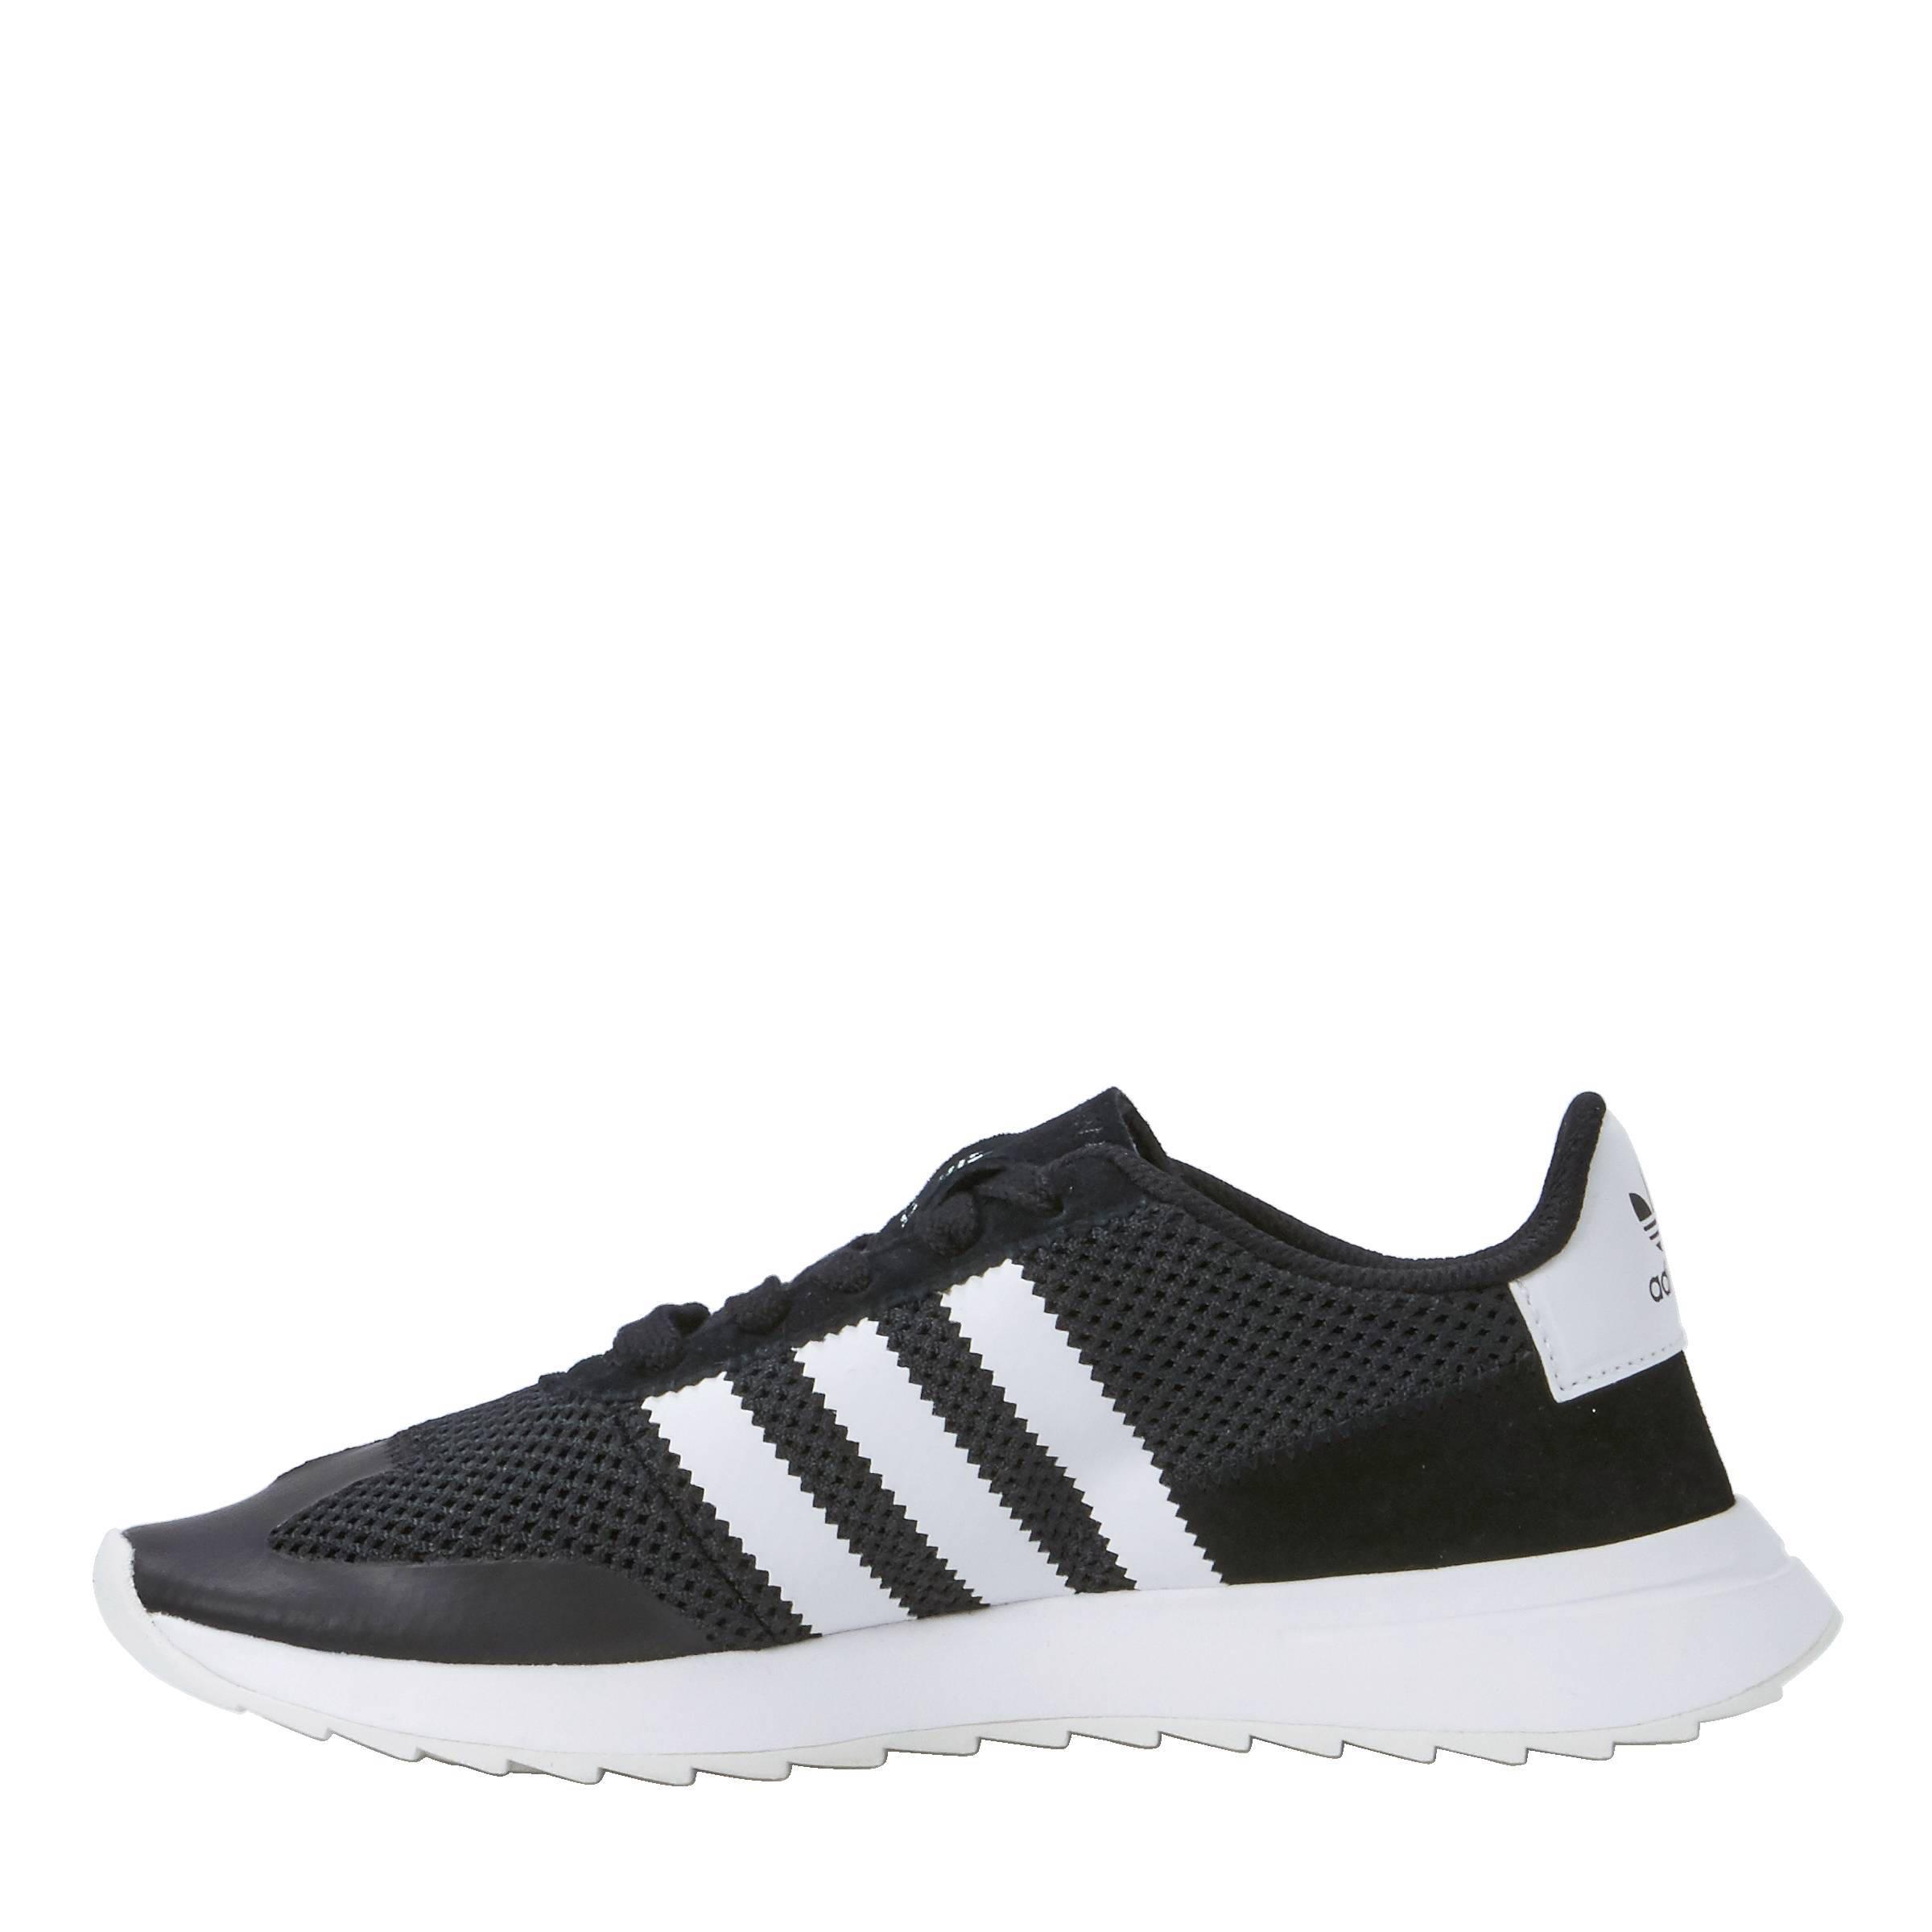 adidas Originals Flashback W sneakers